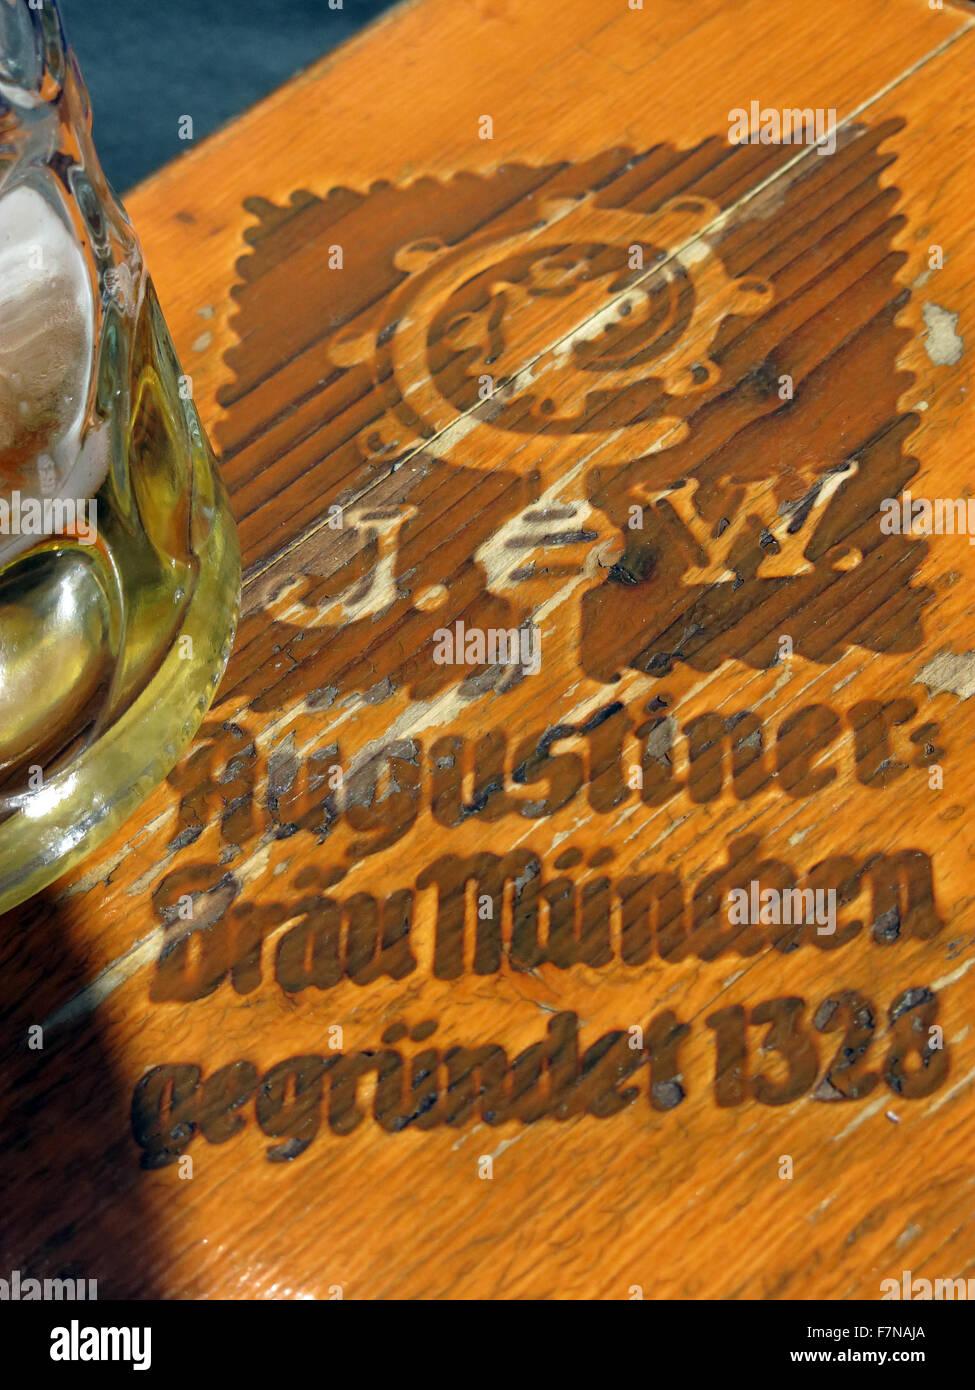 Octoberfest,wood,wooden,stain,brand,beer,bier,beir,glass,1328,jw,gegrunder 1328,mat,beermat,advertising,alcohol,bar,bars,bavarian,beer,brew,brewery,lager,lagers,pils,liter,litre,surface,Munich,Bavaria,Germany,tables,augustiner brau,Gegrunder 1328,Augustiner Brau,GoTonySmith,ale,ammer,autumn,bavaria,beer,beer festival,beer garden,bier,blaukraut,bread,brezen,bright,building,buildings,buy images of,buy pictures of,center,centre,chicken,dirndl,dumplings,enjoyment,event,fairgrounds,festival,field,fun,funfair,garden,garten,germany,gotonysmith,happy,in,kndel,ksesptzle,lederhosen,meadow,munchen,munich,munich octoberfest,munich oktoberfest,october,octoberfest,oktoberfest,oktoberfest beer,pancake,pork,potato,pretzels,reiberdatschi,roast,rotkohl,sauerkraut,scenes,sennerhut,sunny,table,tables,tent,therese,theresienwiese,ticket,tickets,tourism,tourist,tourists,tradition,traditional,travelling,tree,trees,unity day,volksfest,wiesn,Buy Pictures of,Buy Images Of